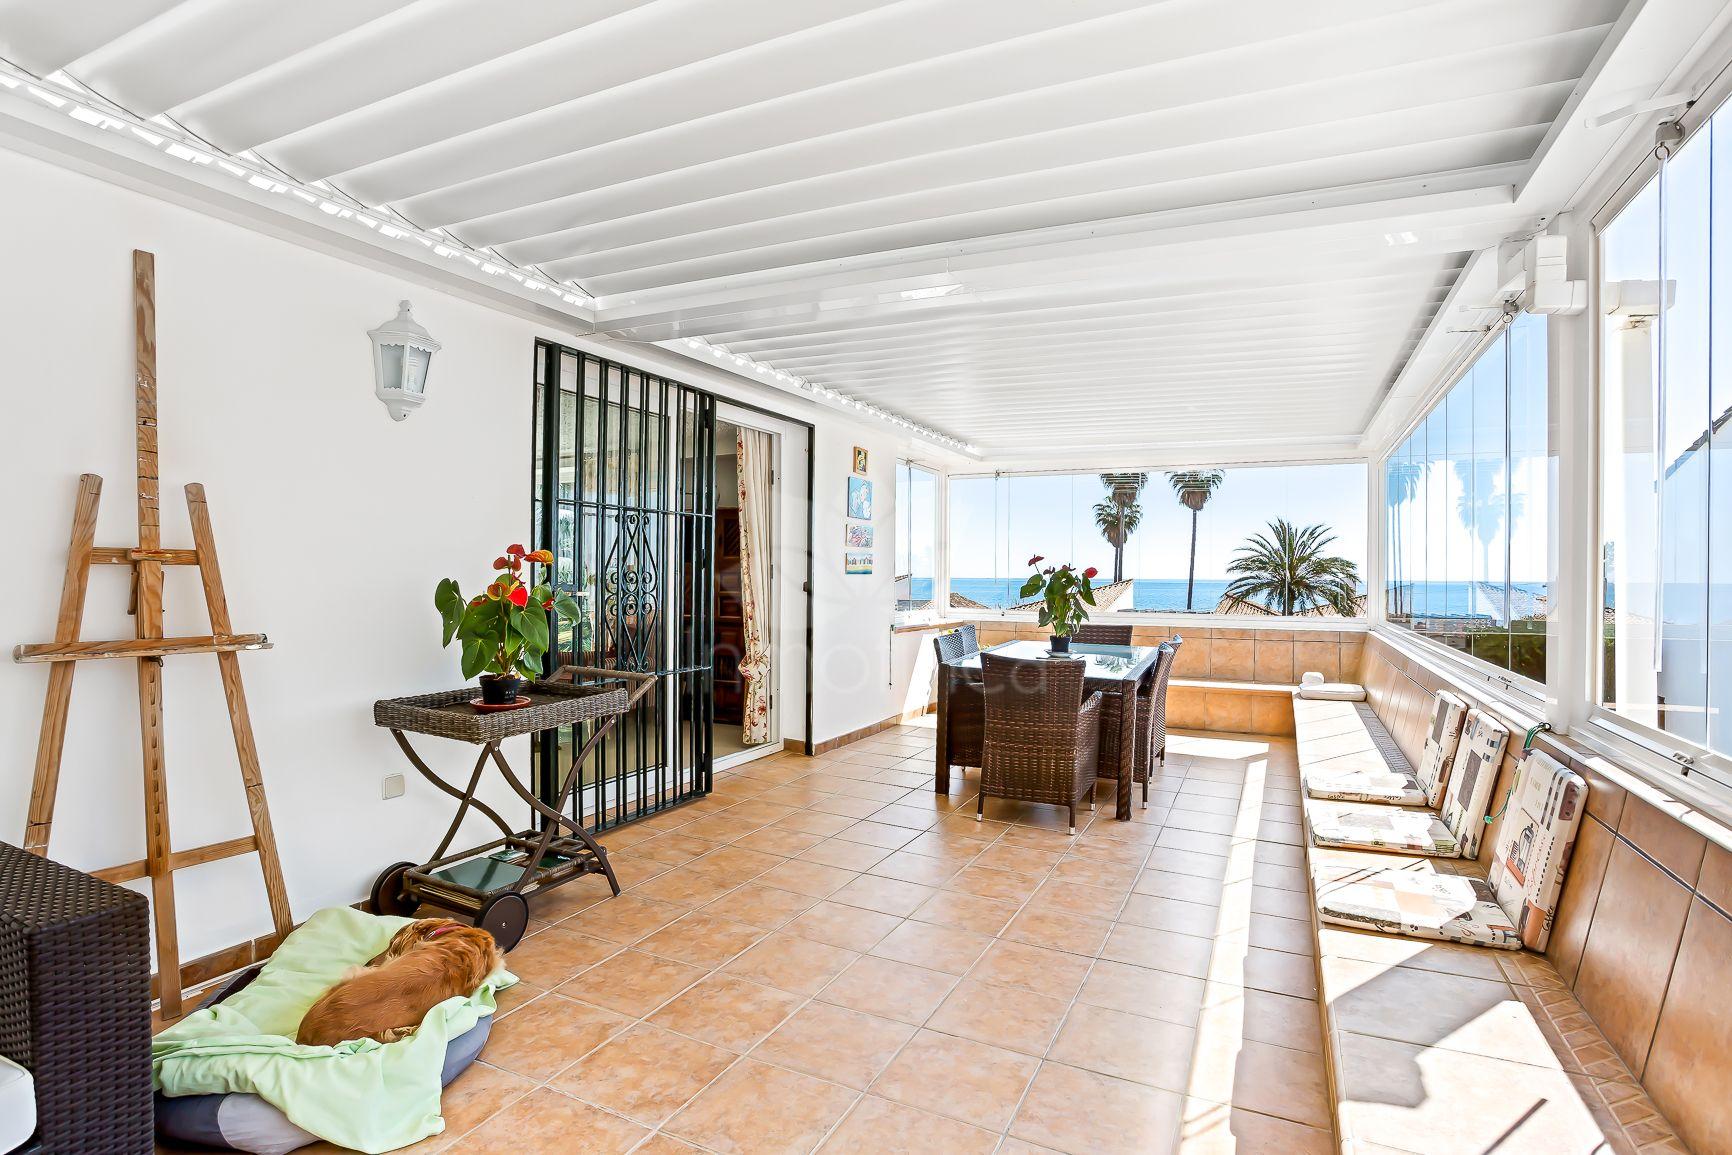 Villa in Bahia Dorada, Estepona